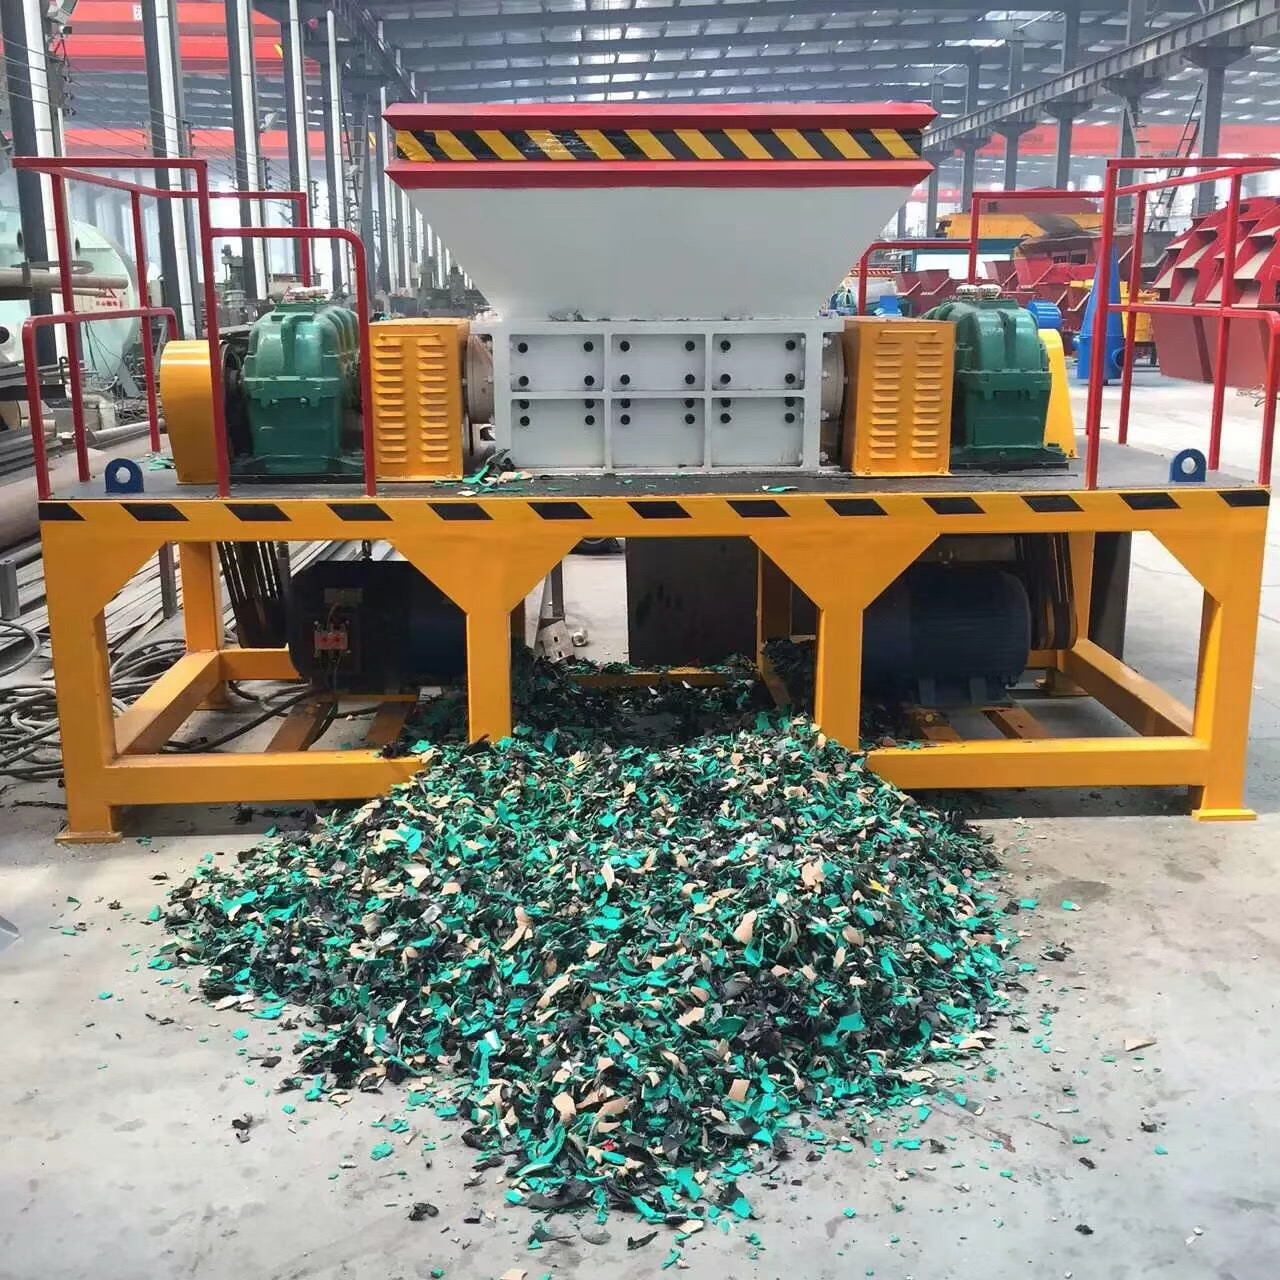 China Metal Shredder Machine Manufacturer Double Shaft Waste Metal Shredding Machine Metal Scrap Oil